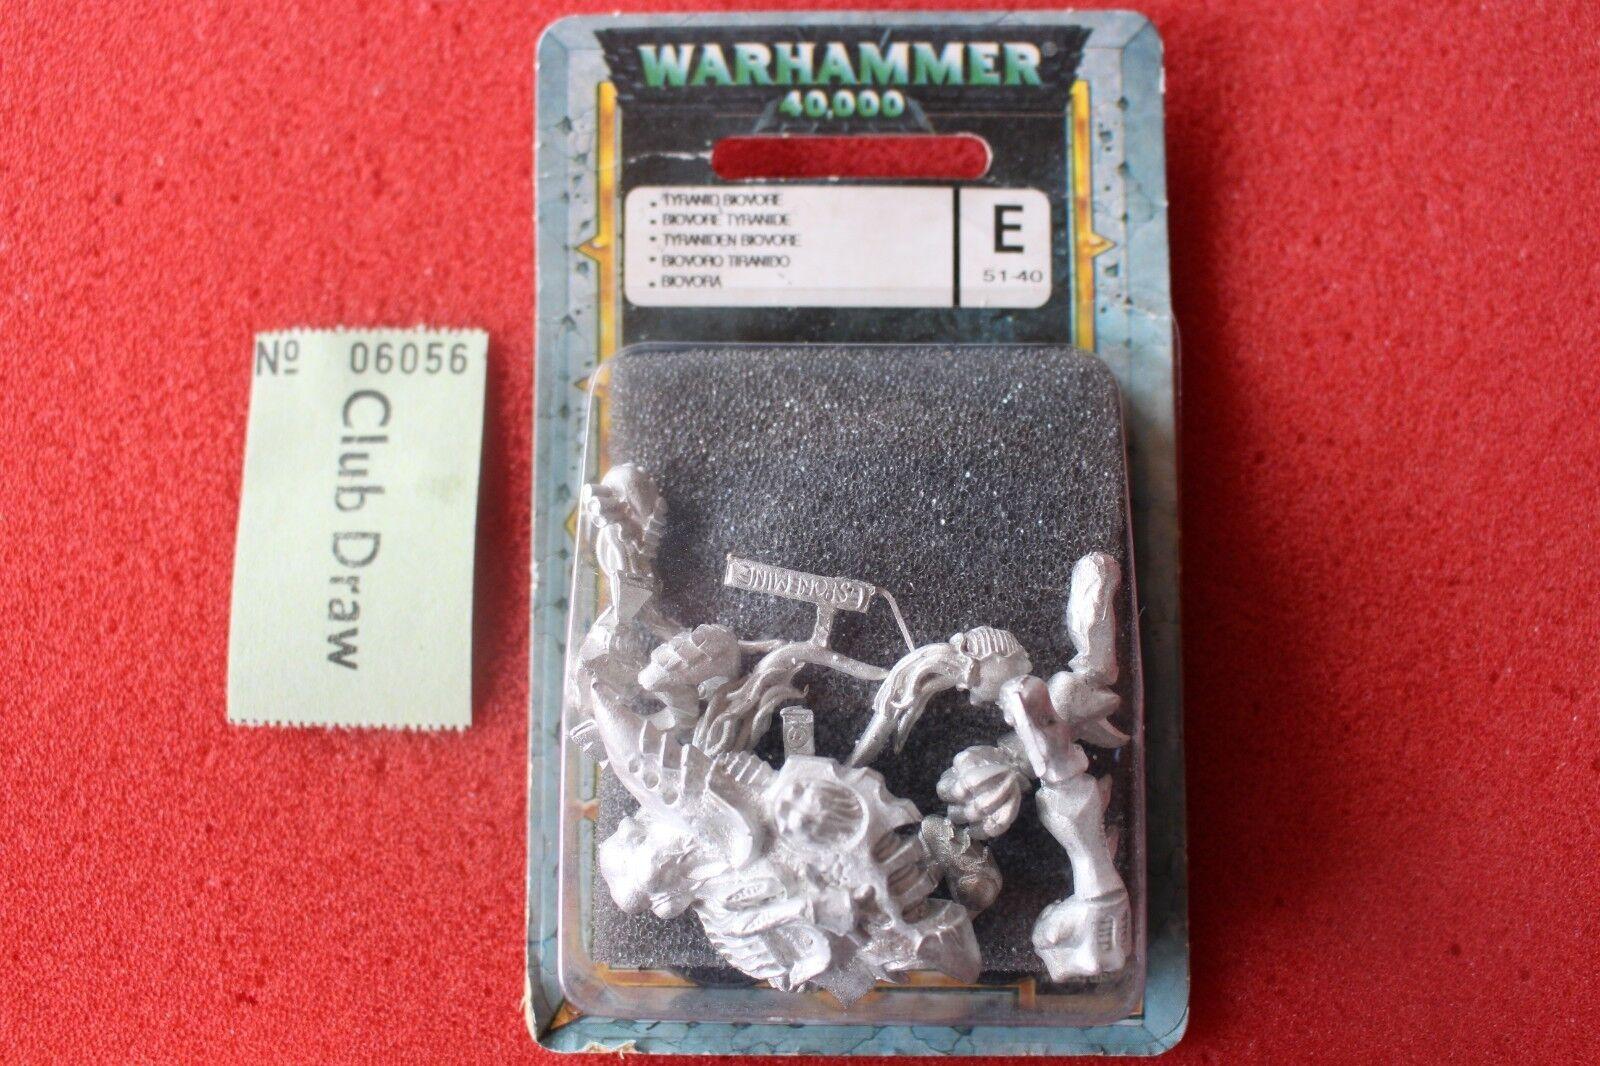 Games Workshop Warhammer 40k Tyranid Biovore Metal New Figures BNIB Tyranids GW